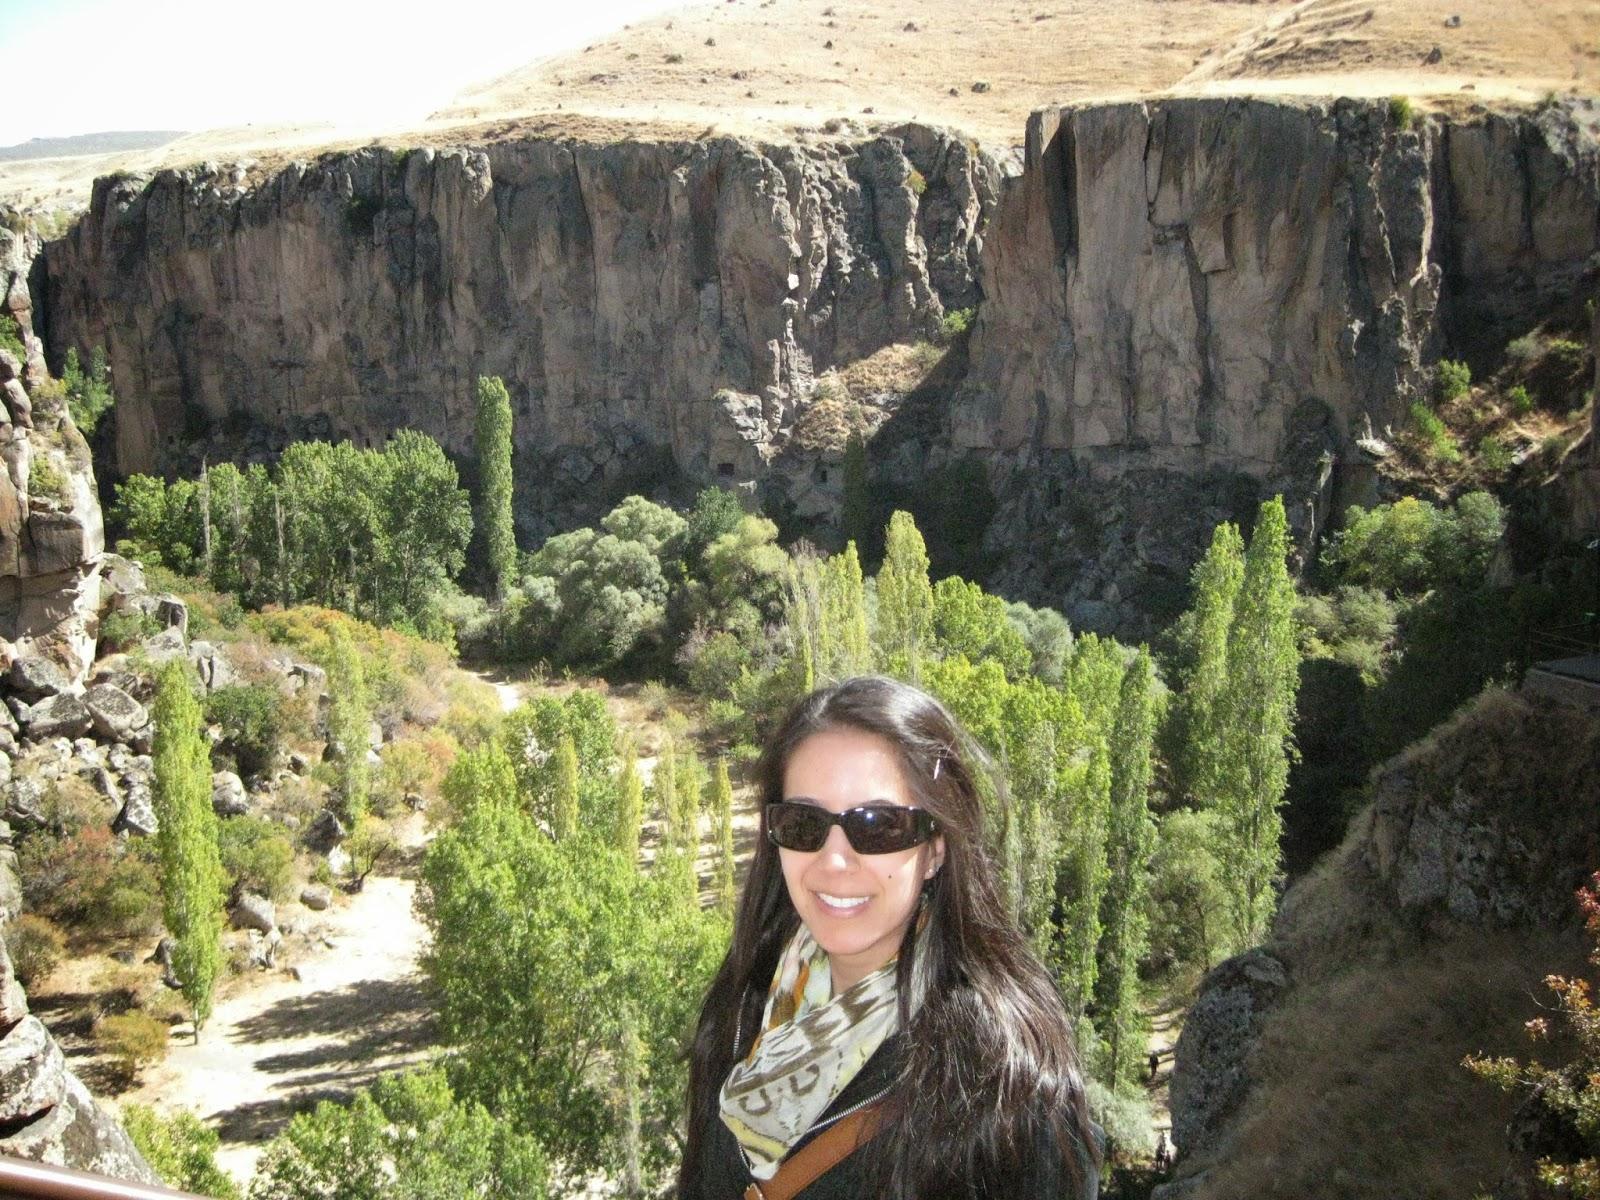 Cappadocia - Hiking in Ihlara Valley